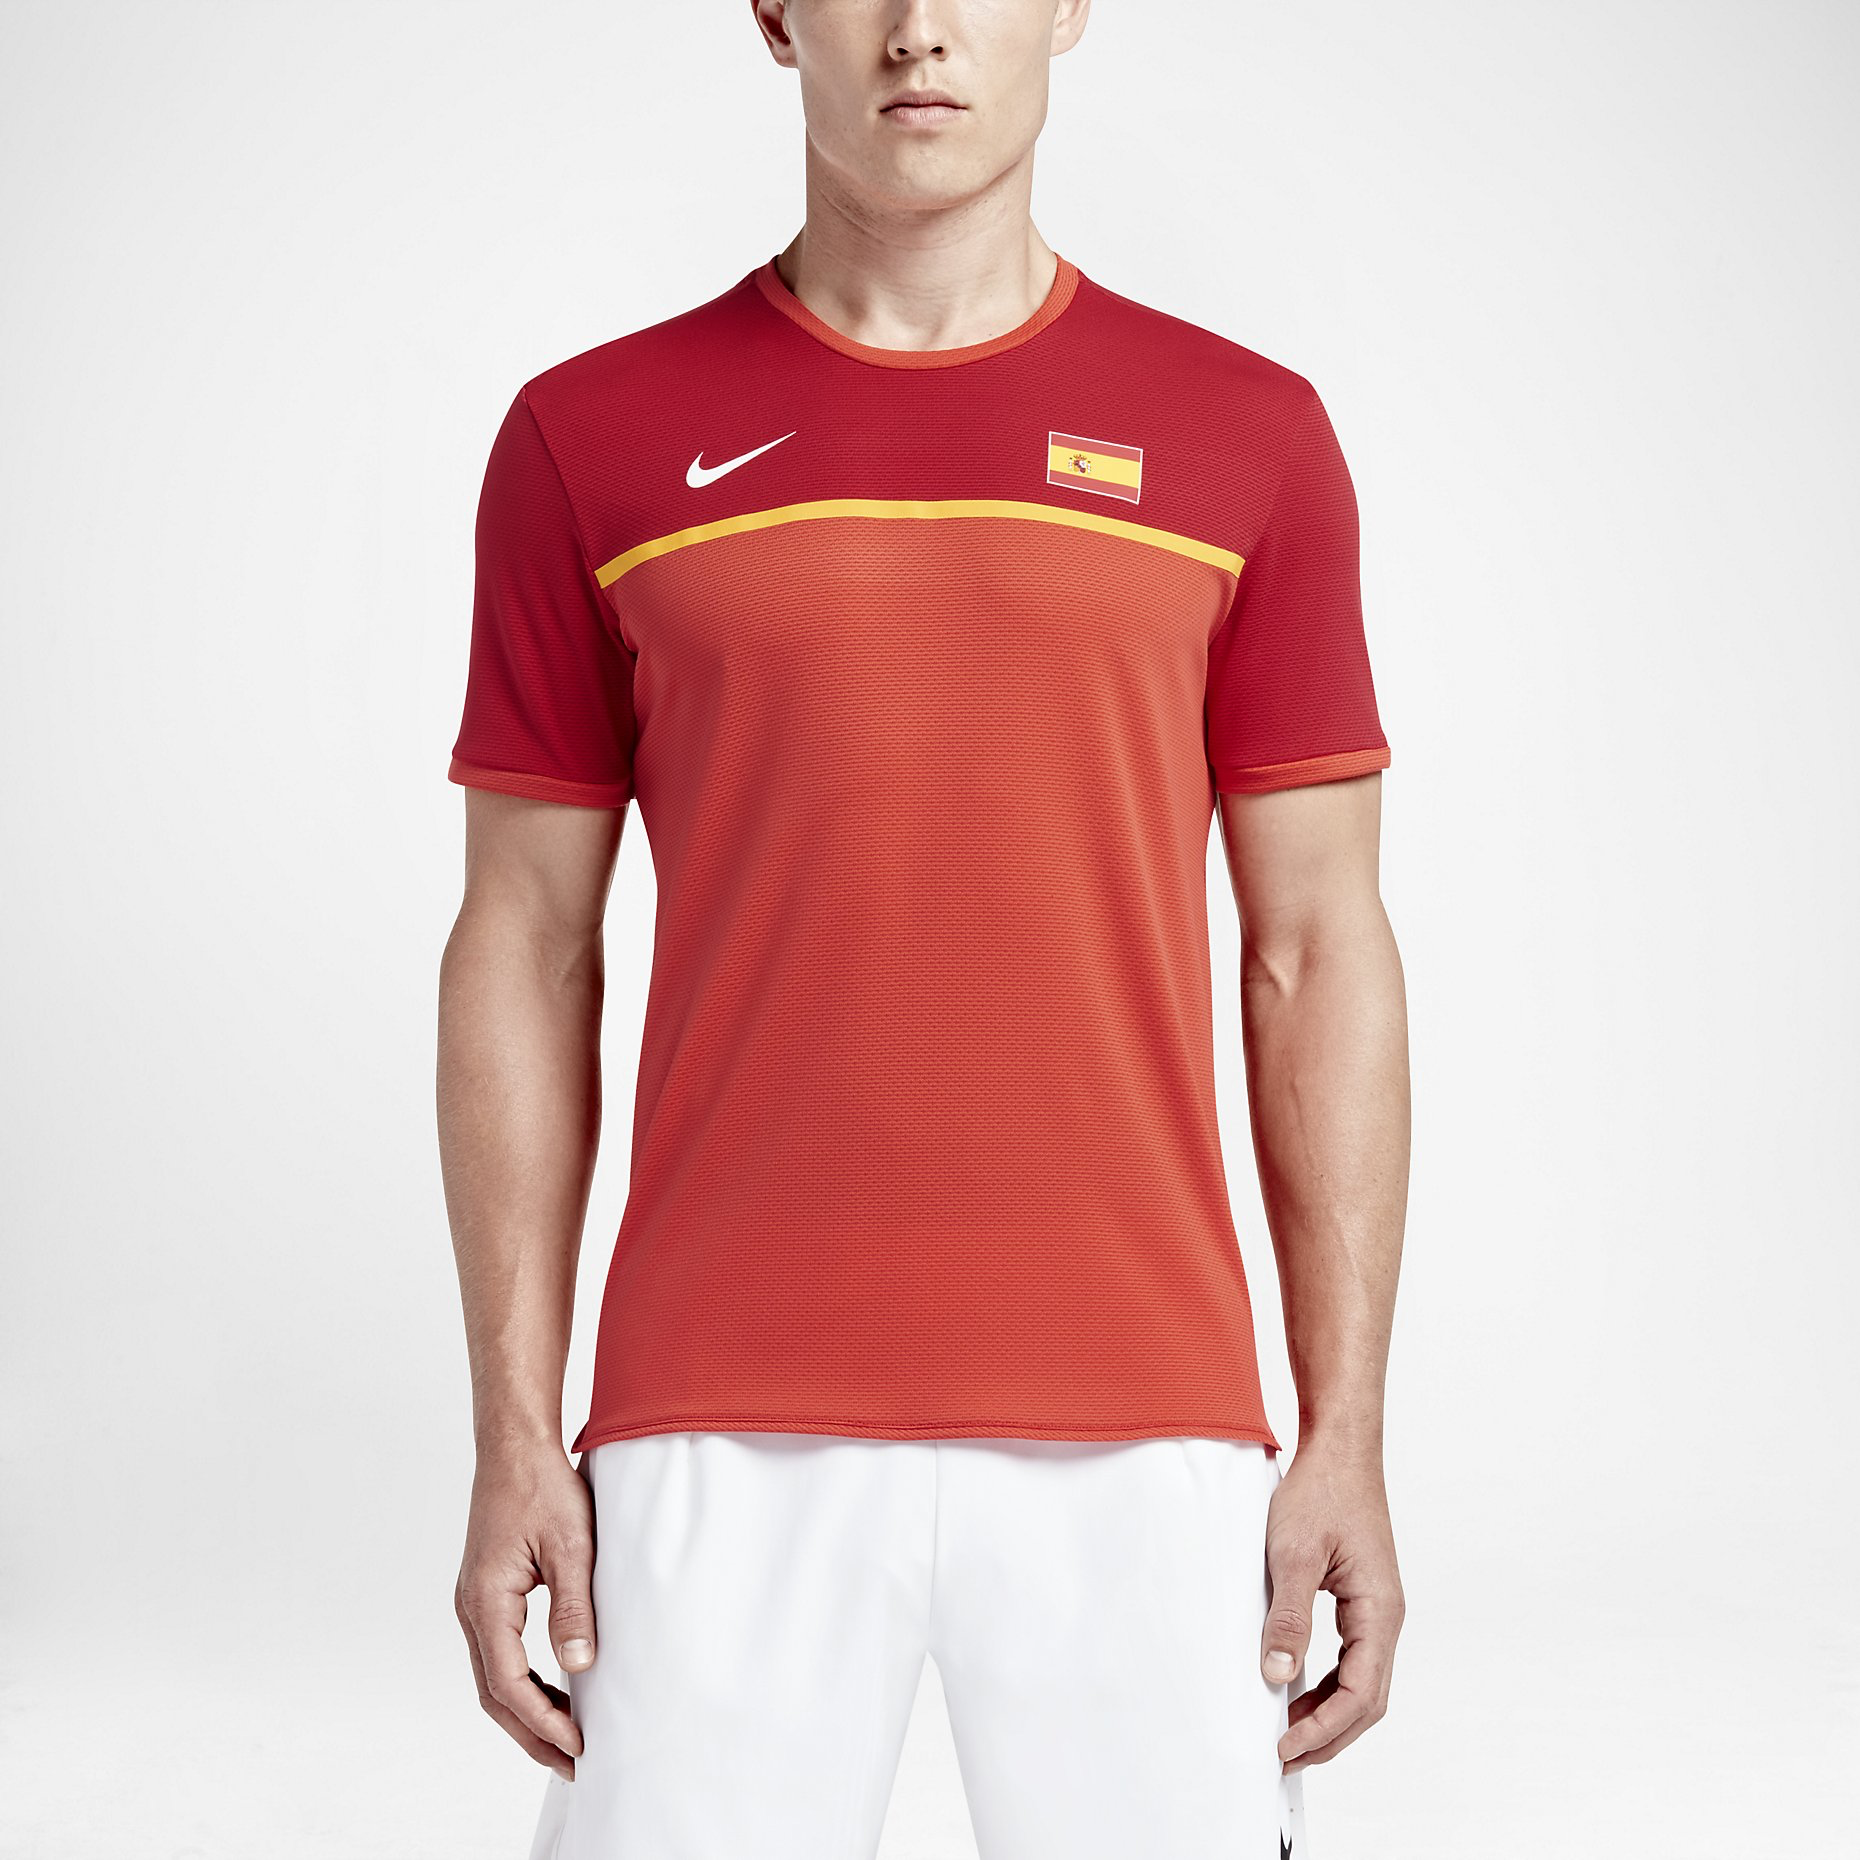 03e58633150ab Rafael Nadal s T-shirt for Rio Olympics Nike Nadal   Tennis Style On ...